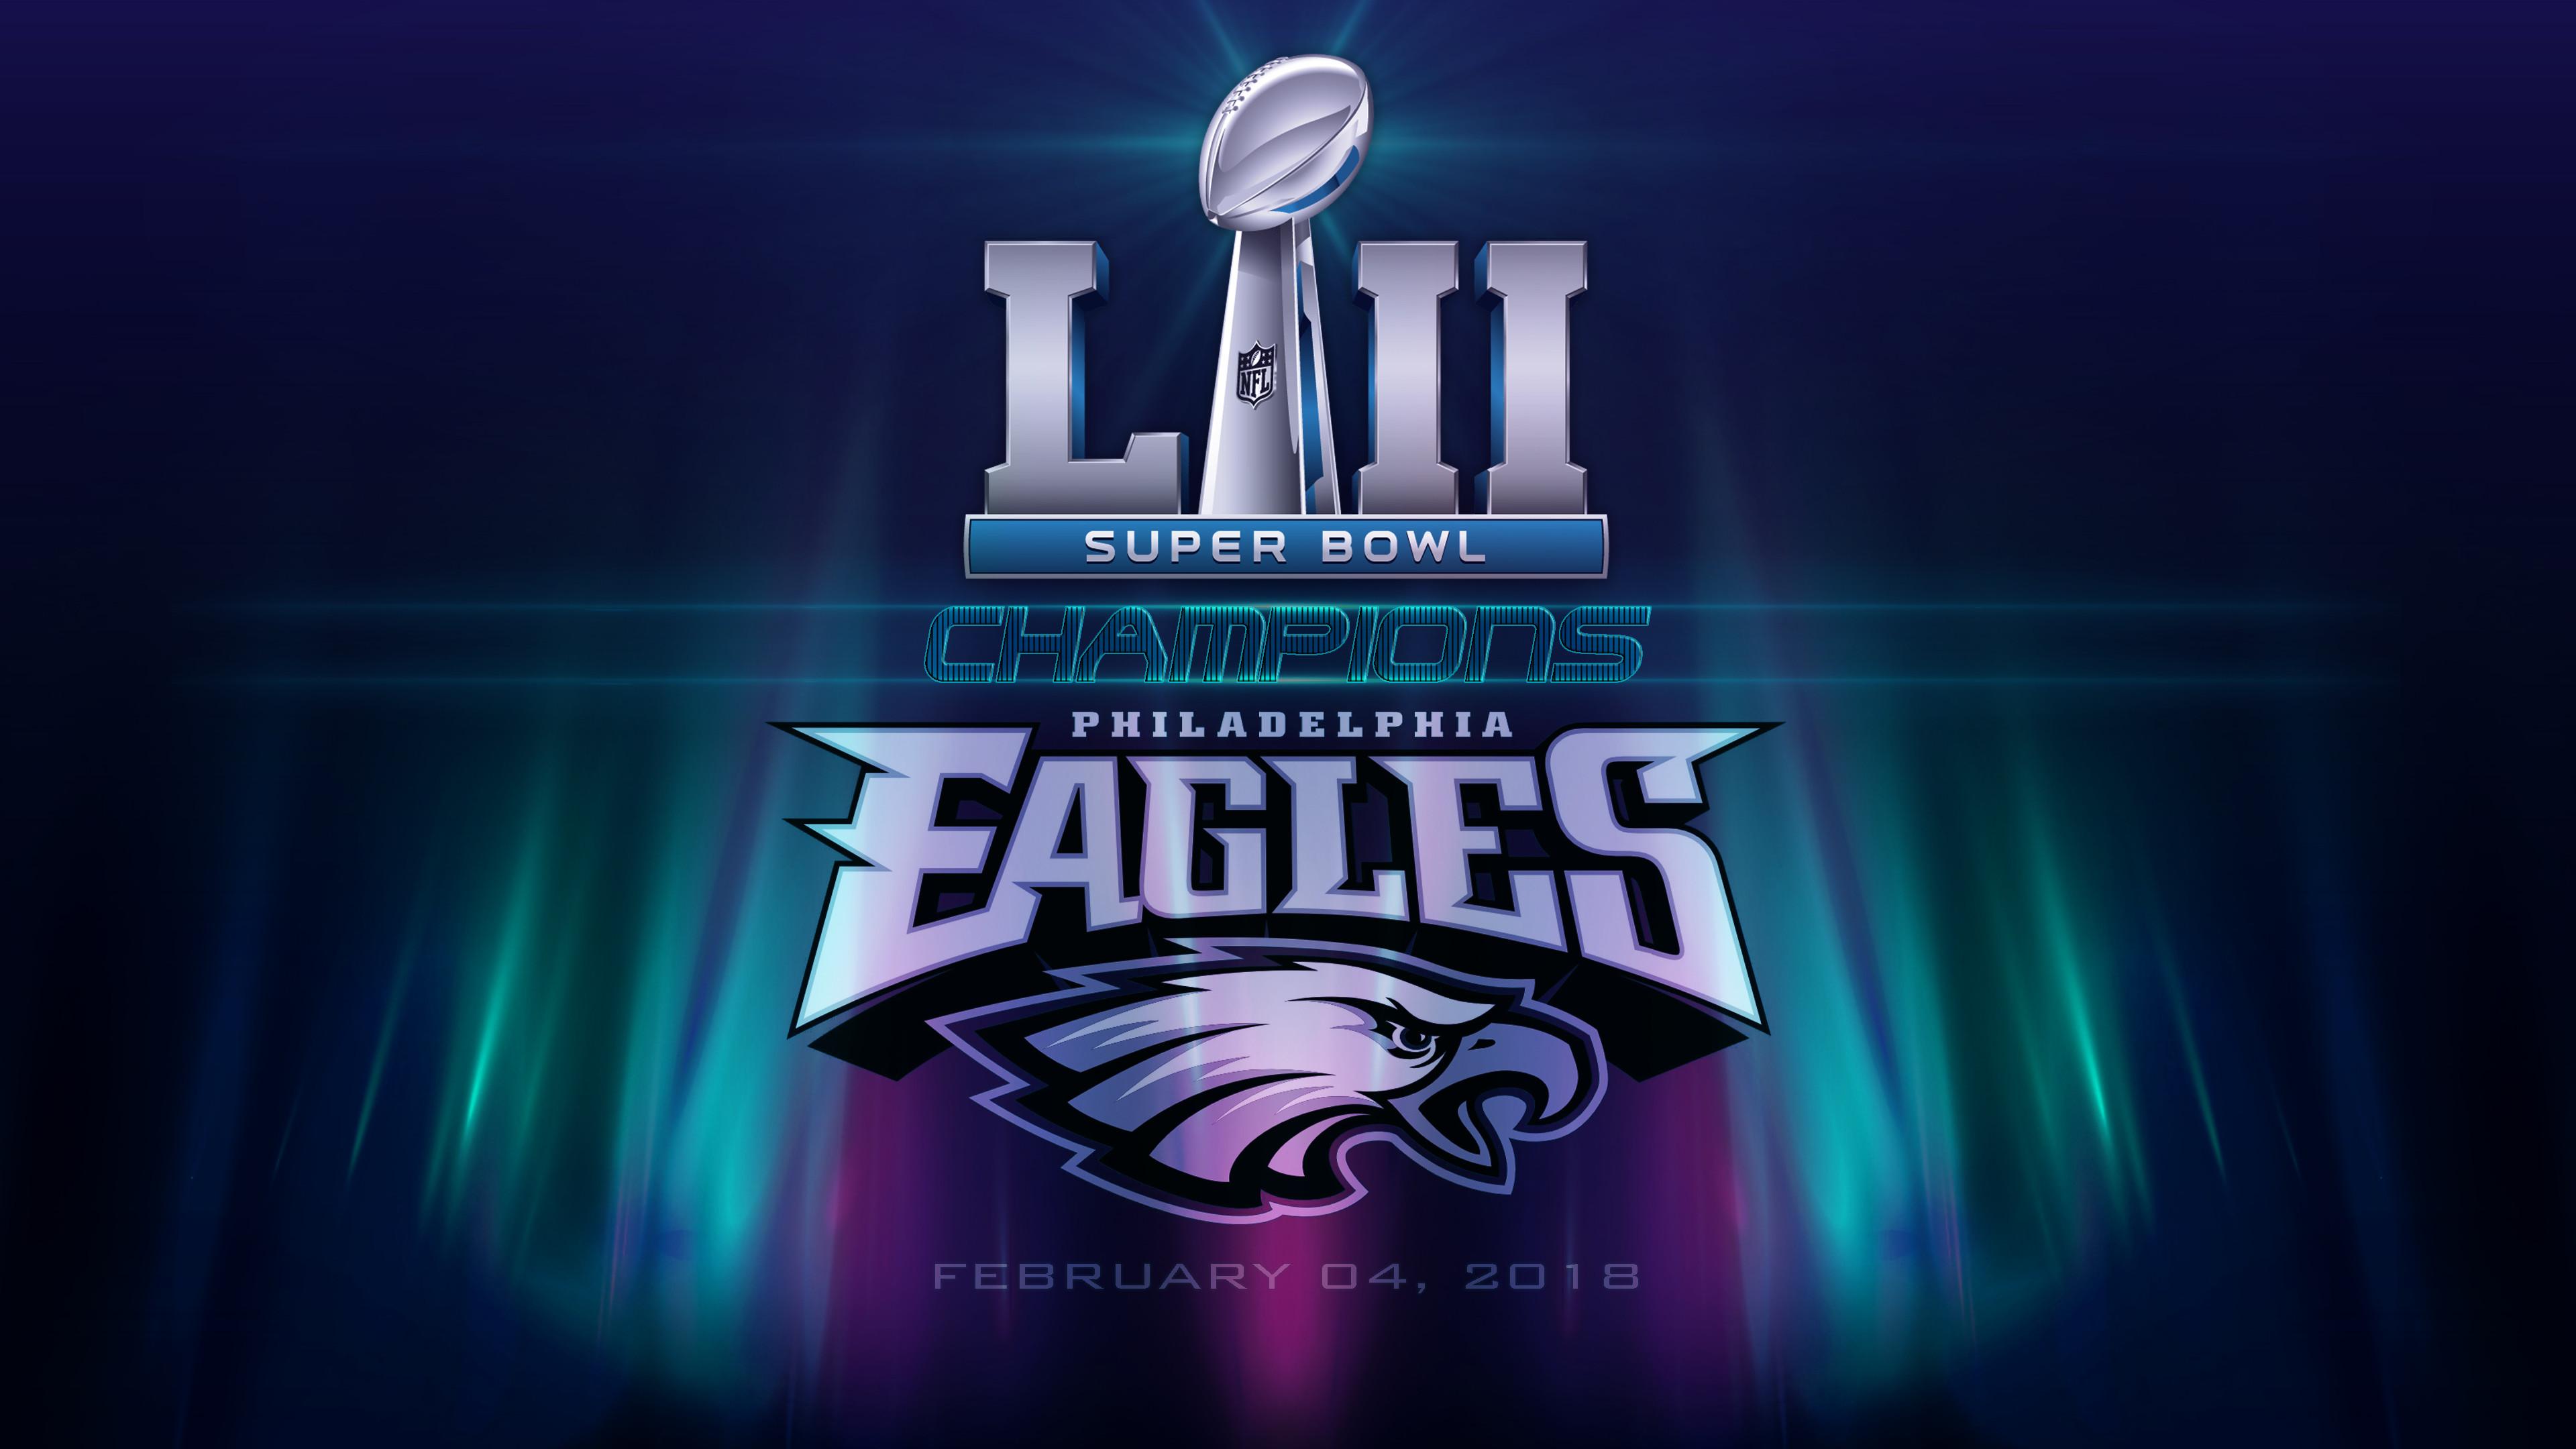 Super Bowl Wallpaper 2018 (90+ images)